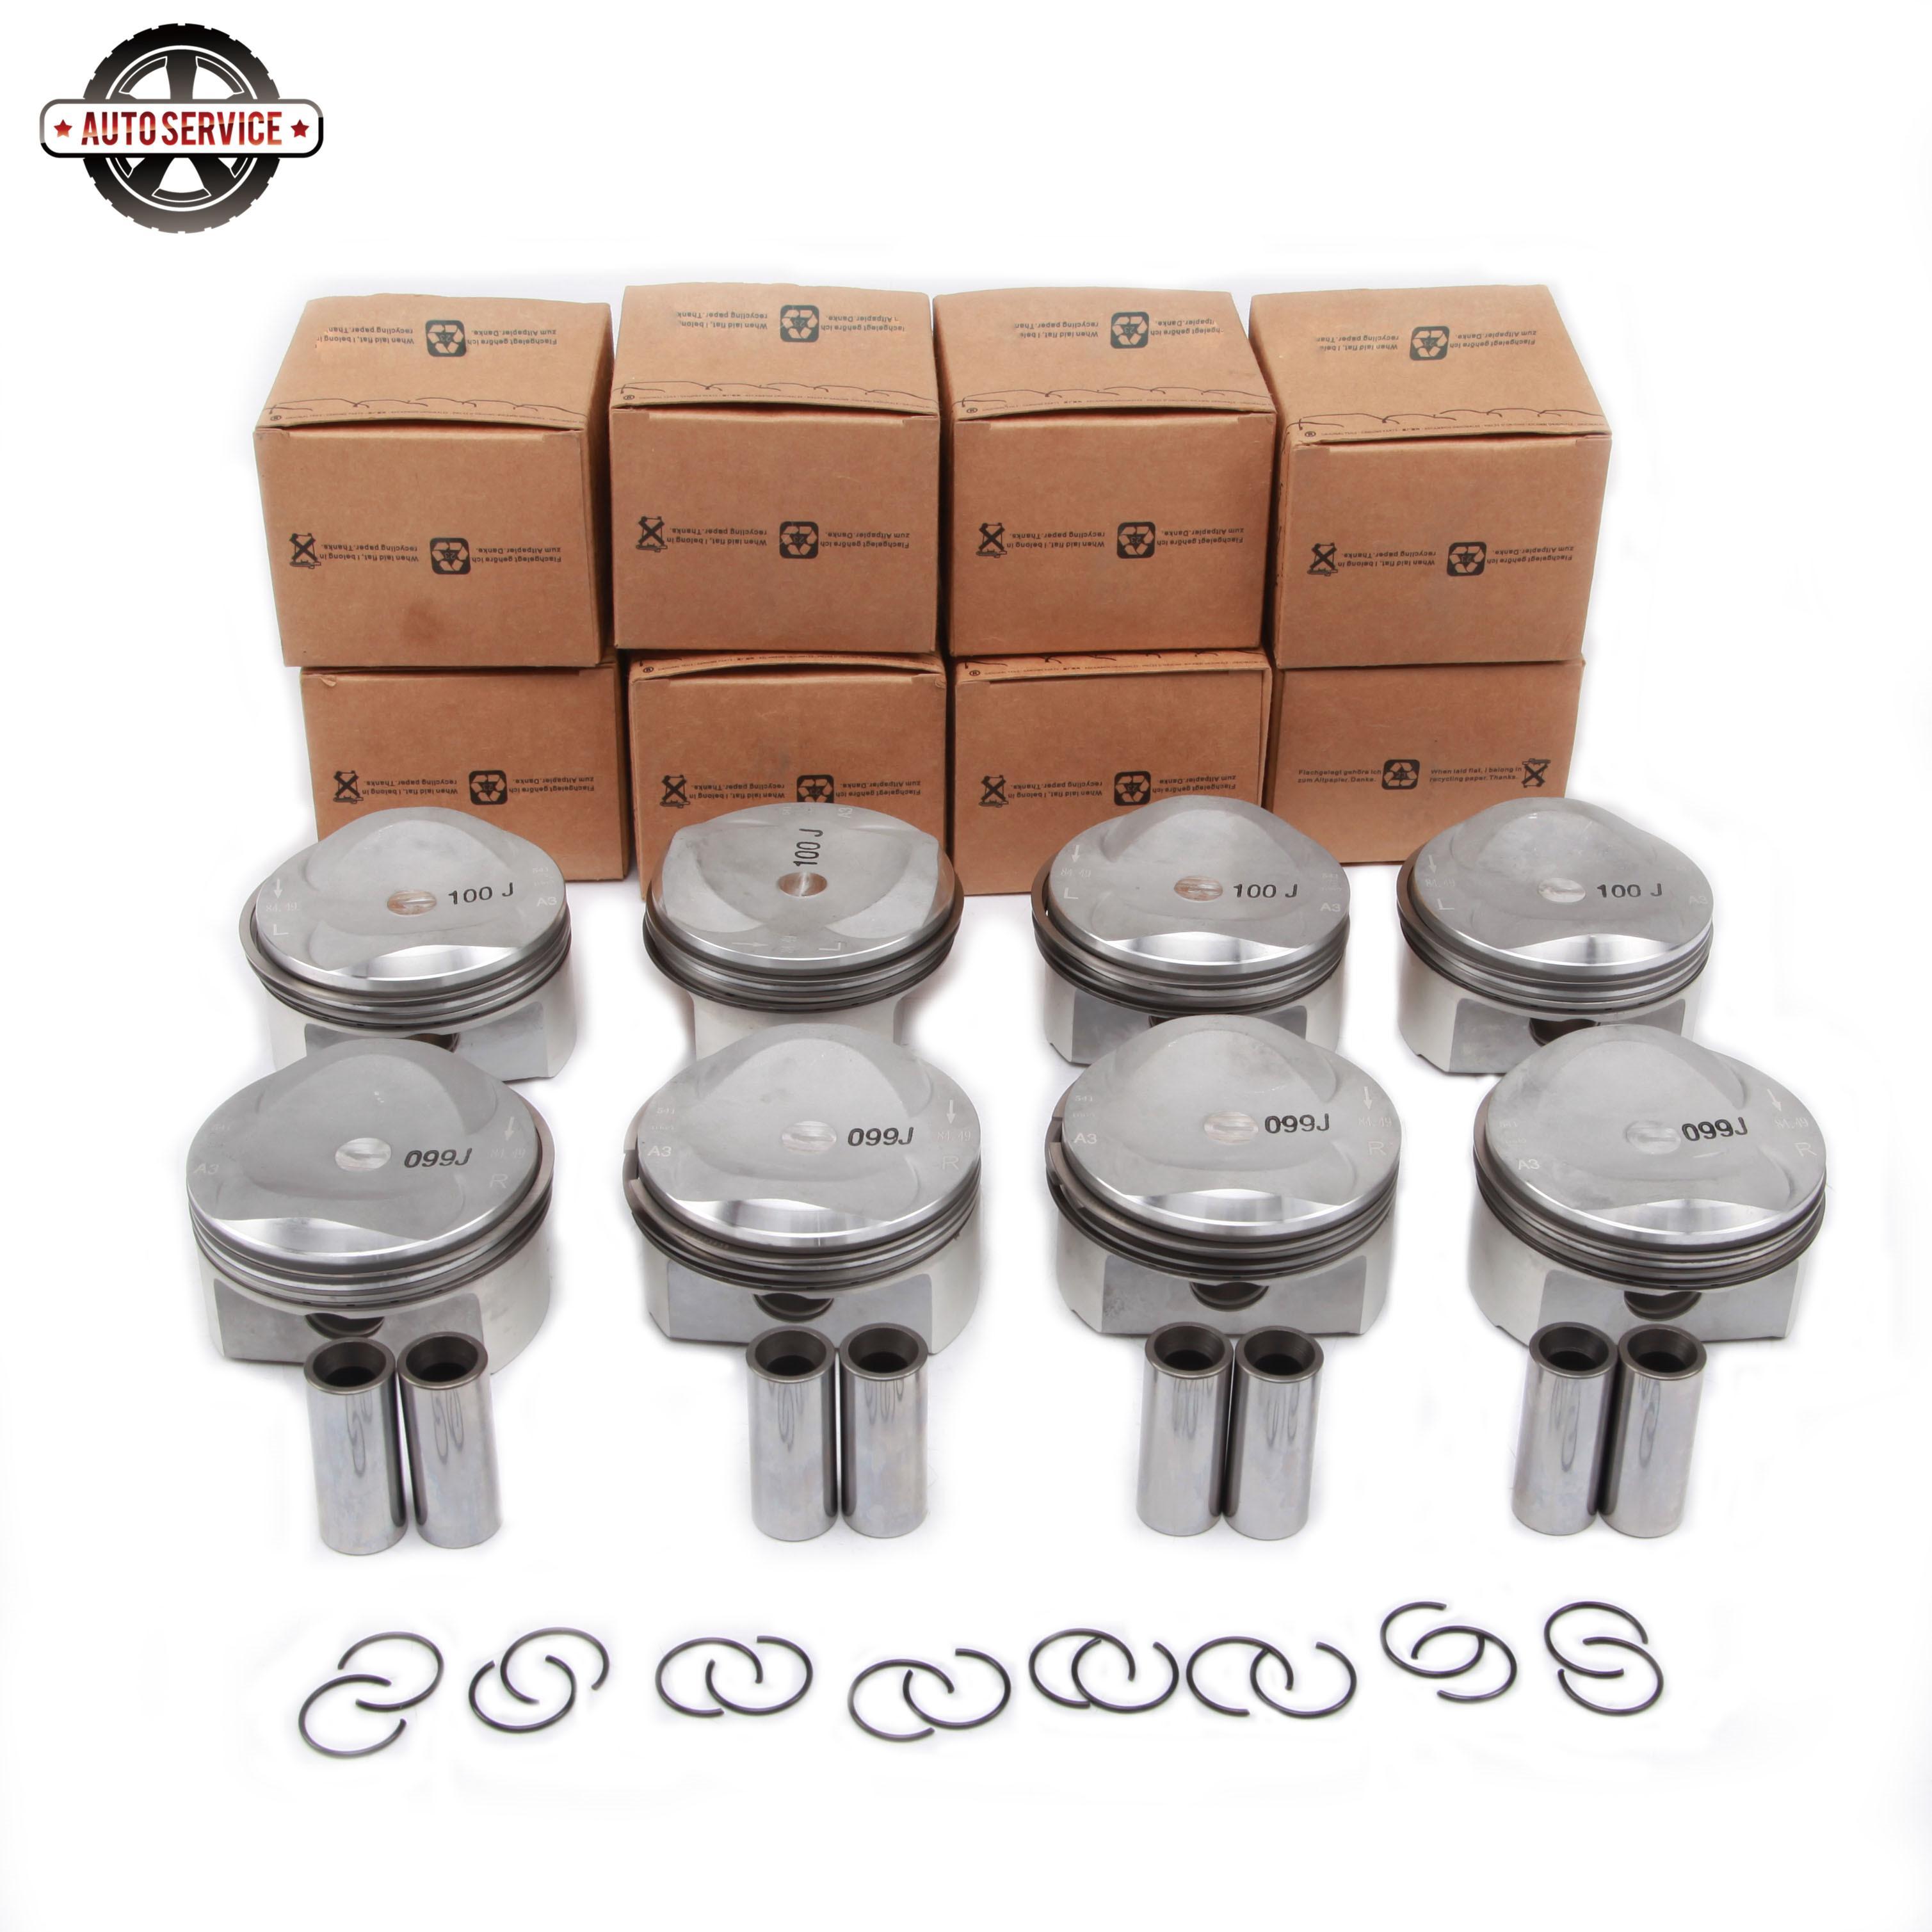 Nuevo 079 107 065 DC motor de pistón y anillos Kit para Audi A6 A5 A8 Q7 Avant Quattro Volkswagen Touareg Volkswagen 4.2L perno 20 mm 079 107 066 DC